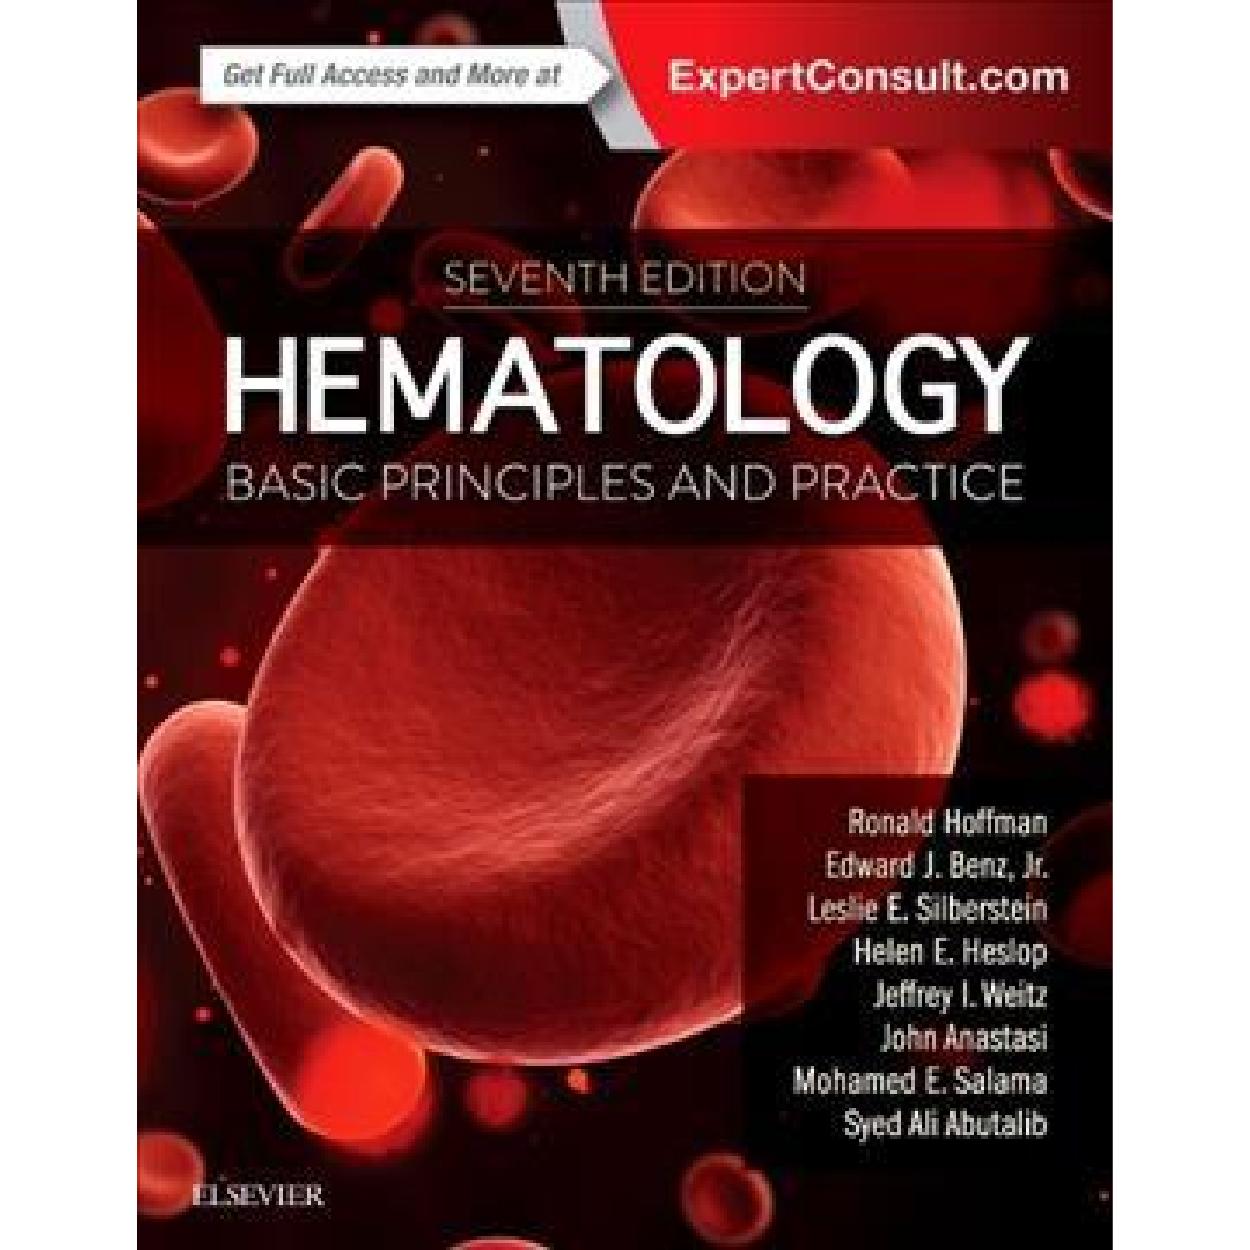 Hematology : Basic Principles and Practice